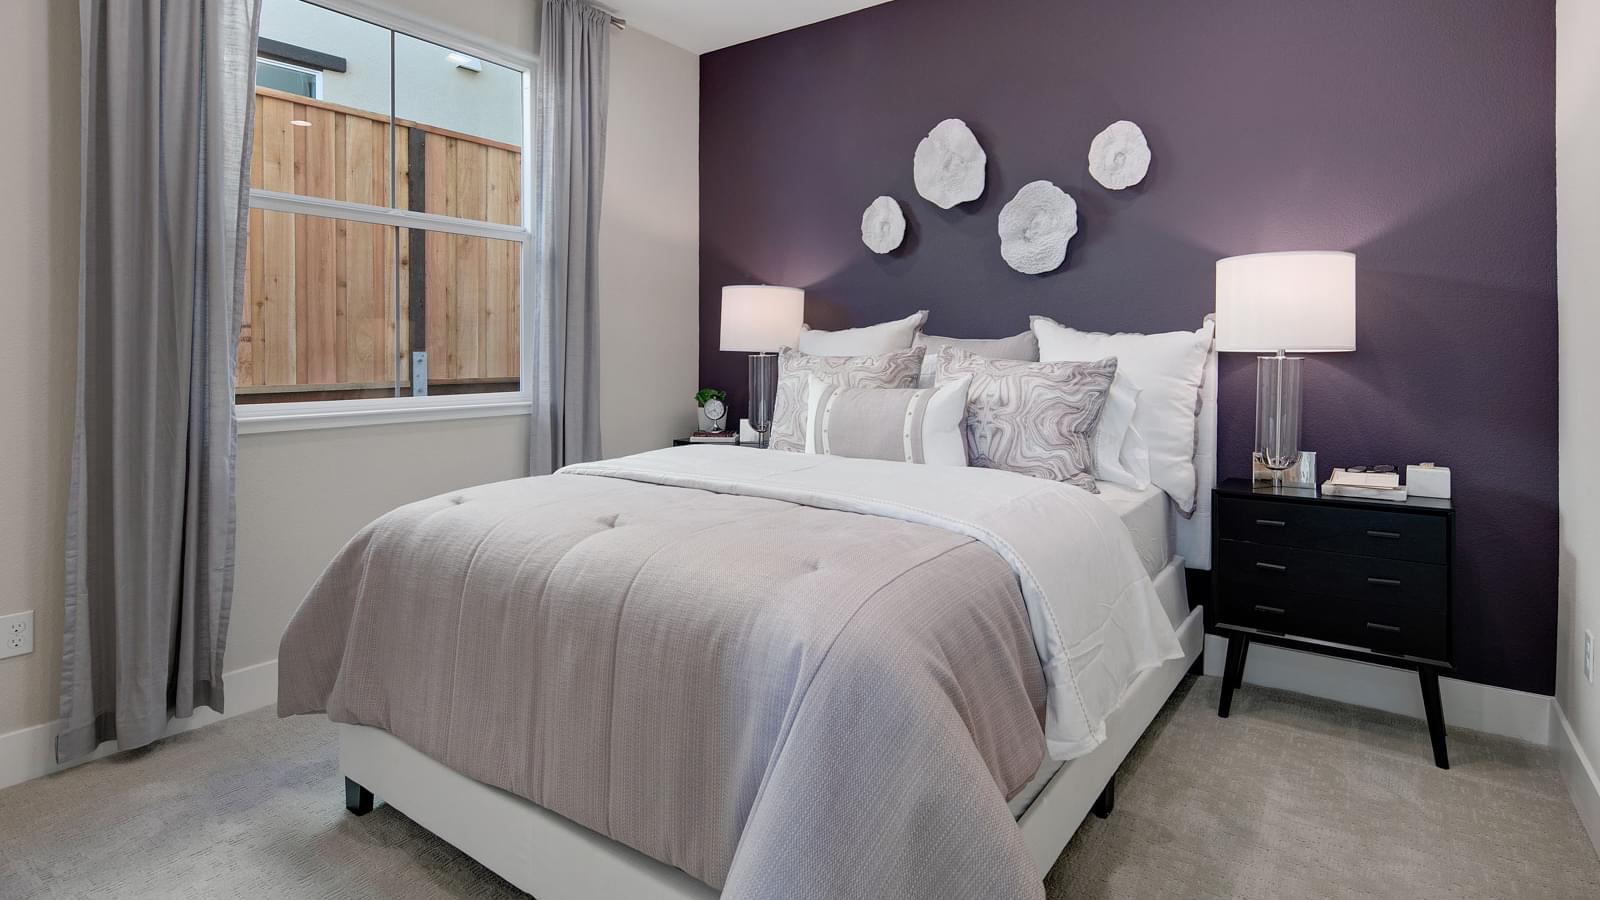 Residence 1 Bedroom 4